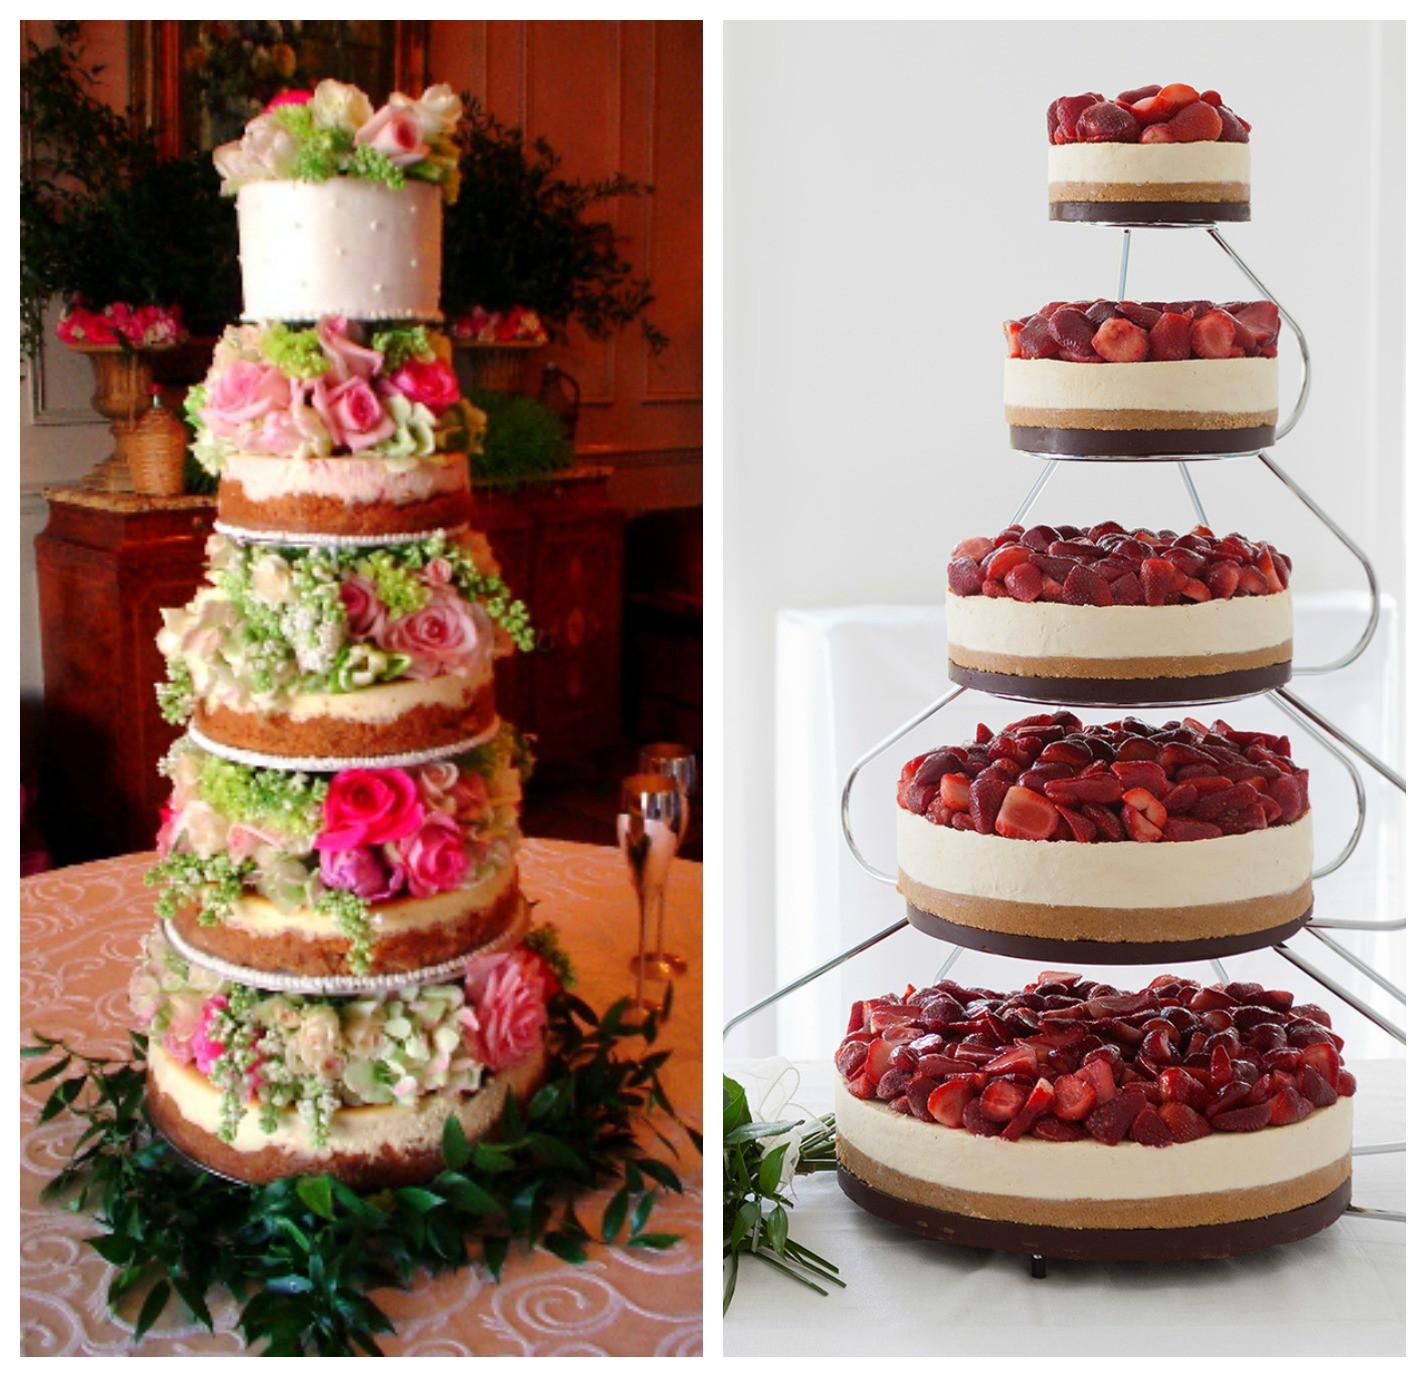 Wedding Cake Recipes For Tiered Cakes  Tea & Doilies